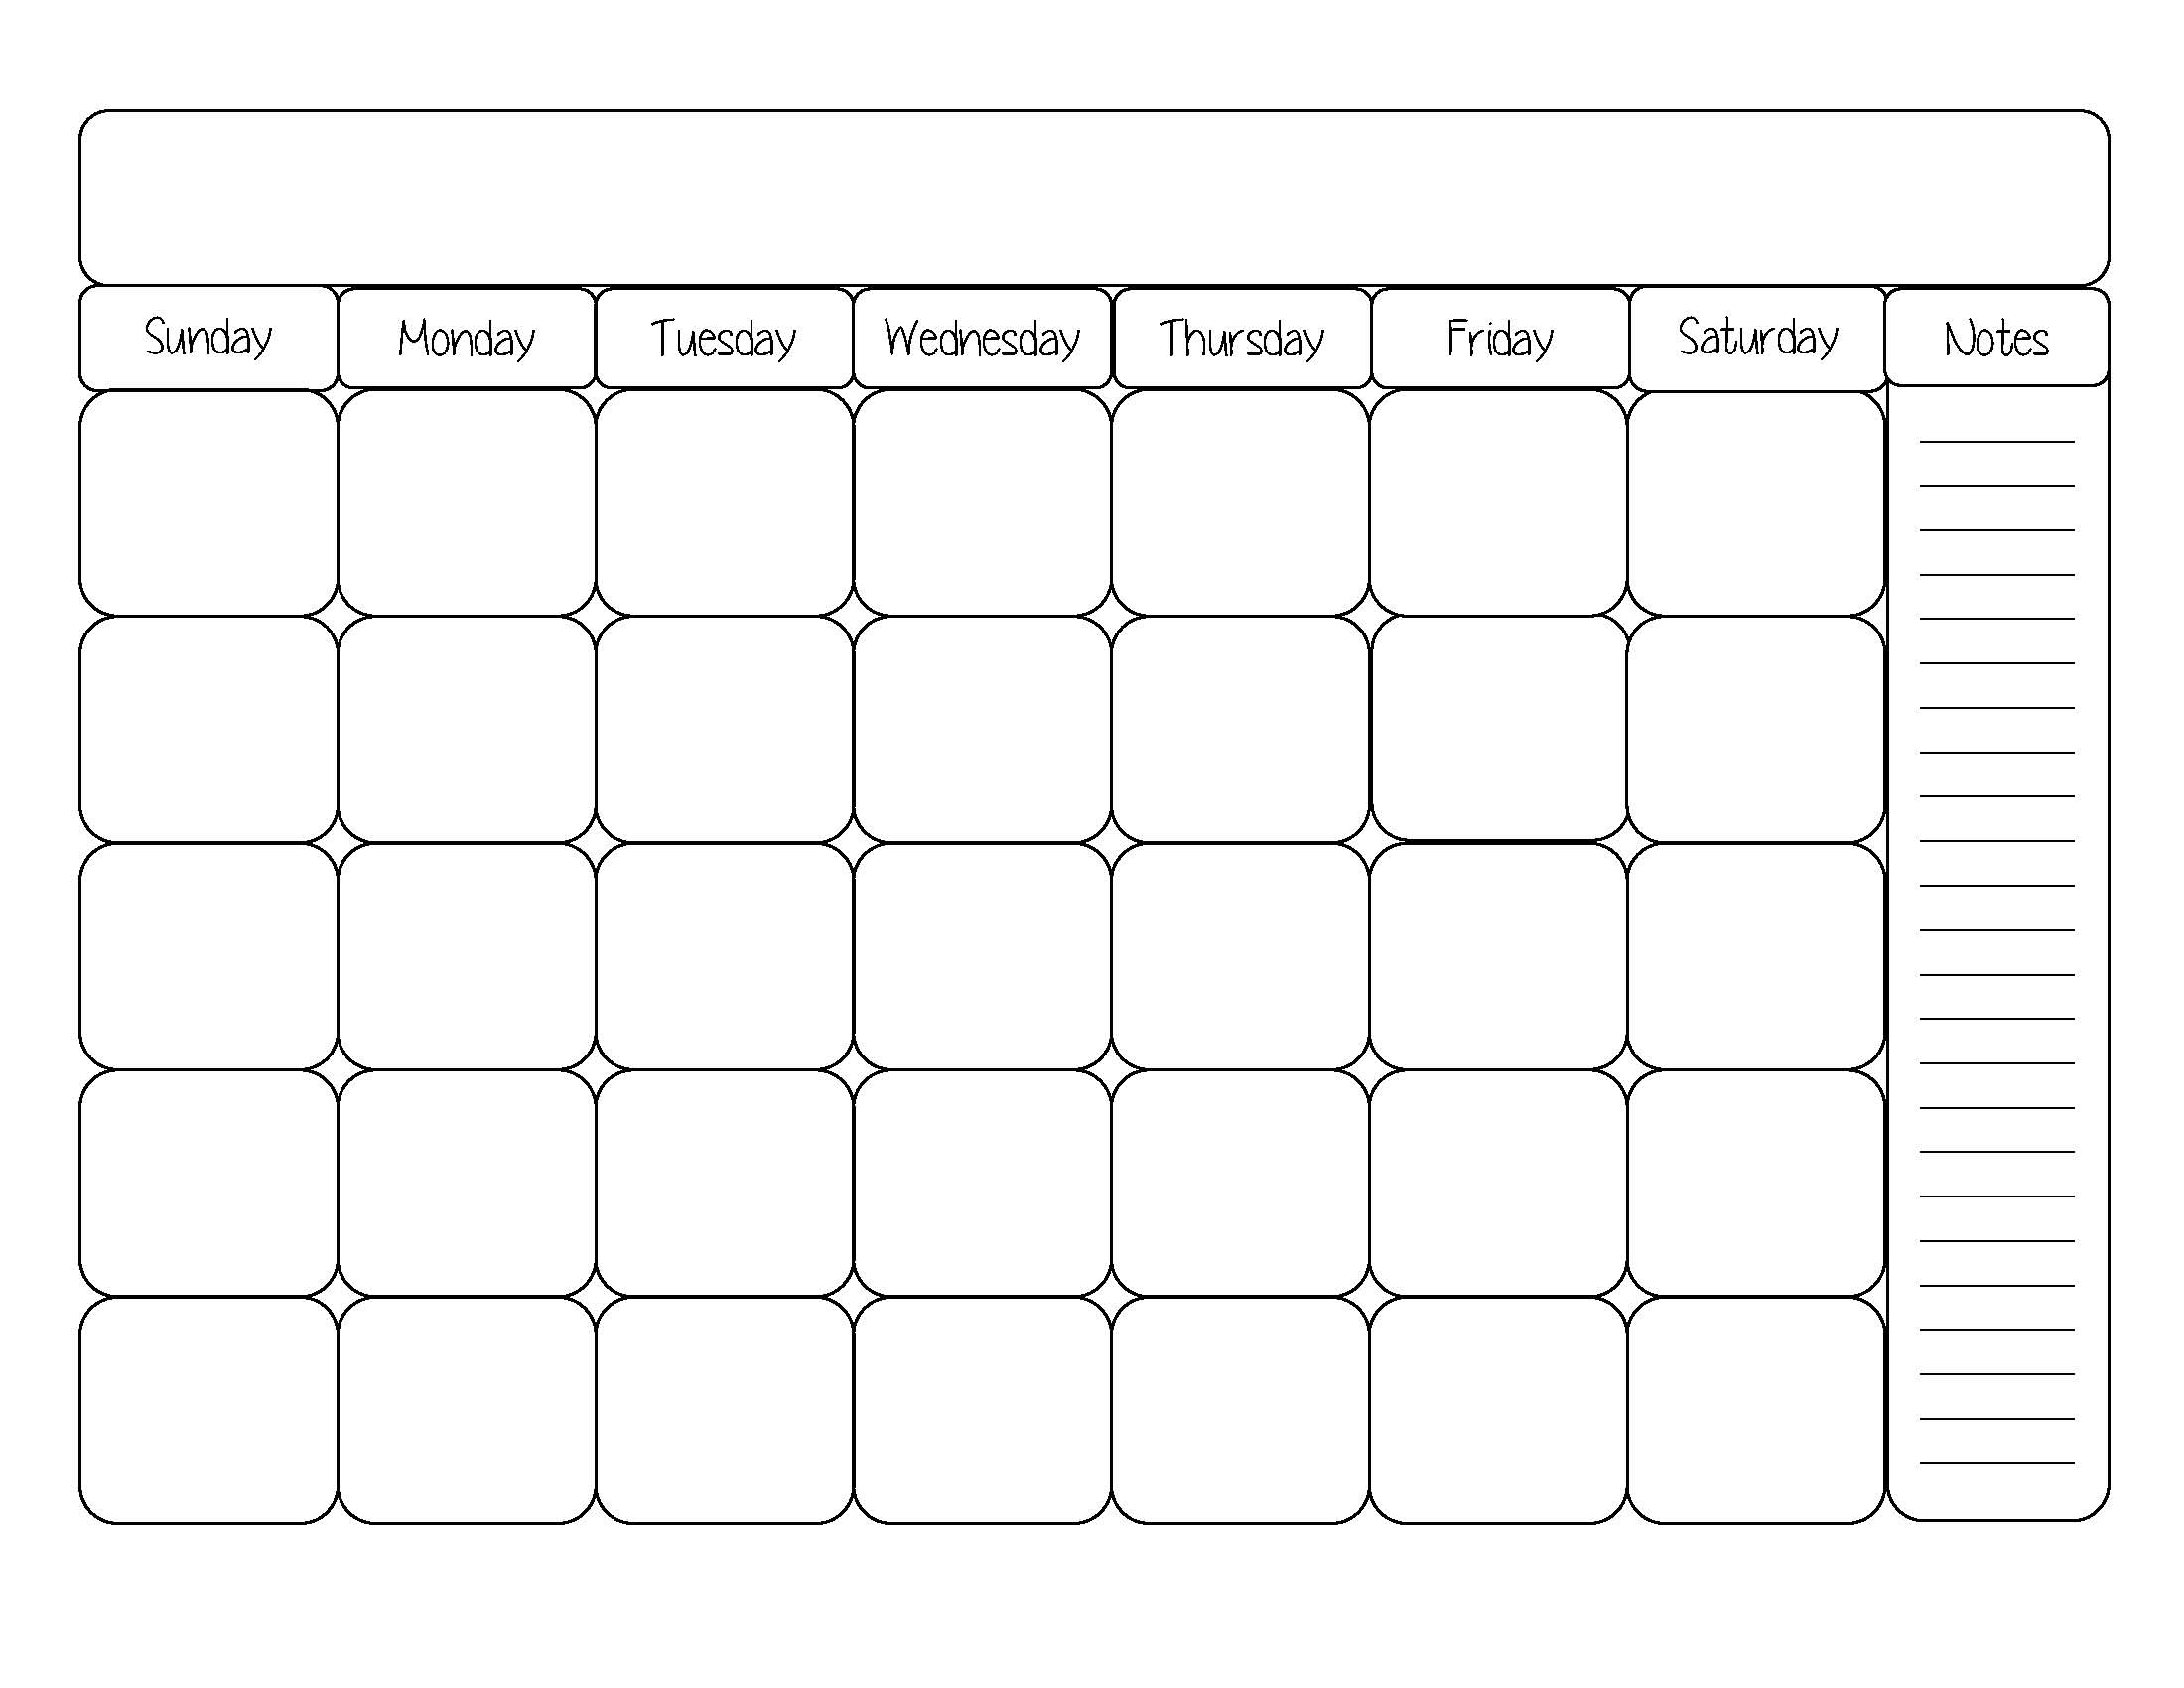 Free Online Calendar Template | great printable calendars